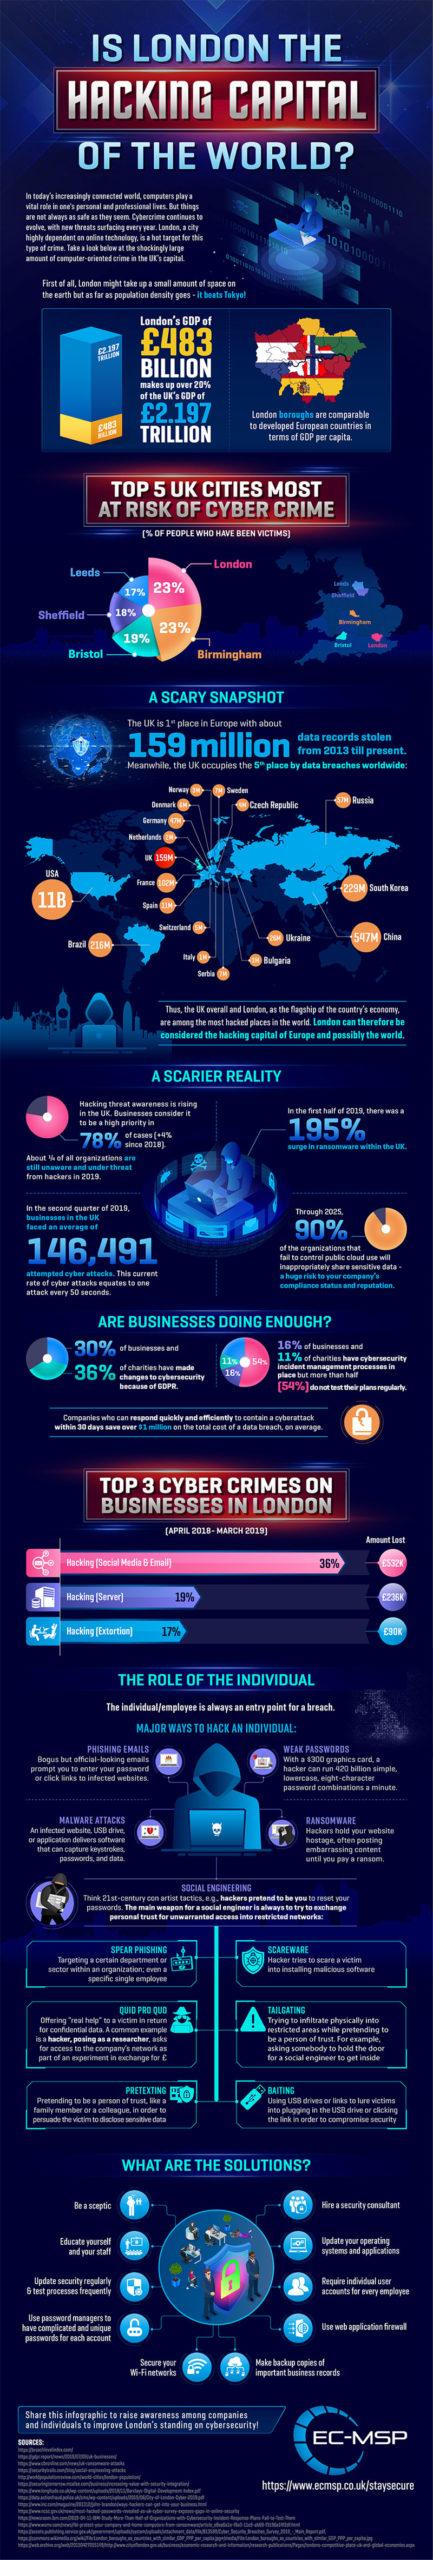 london hacking capital world infographic